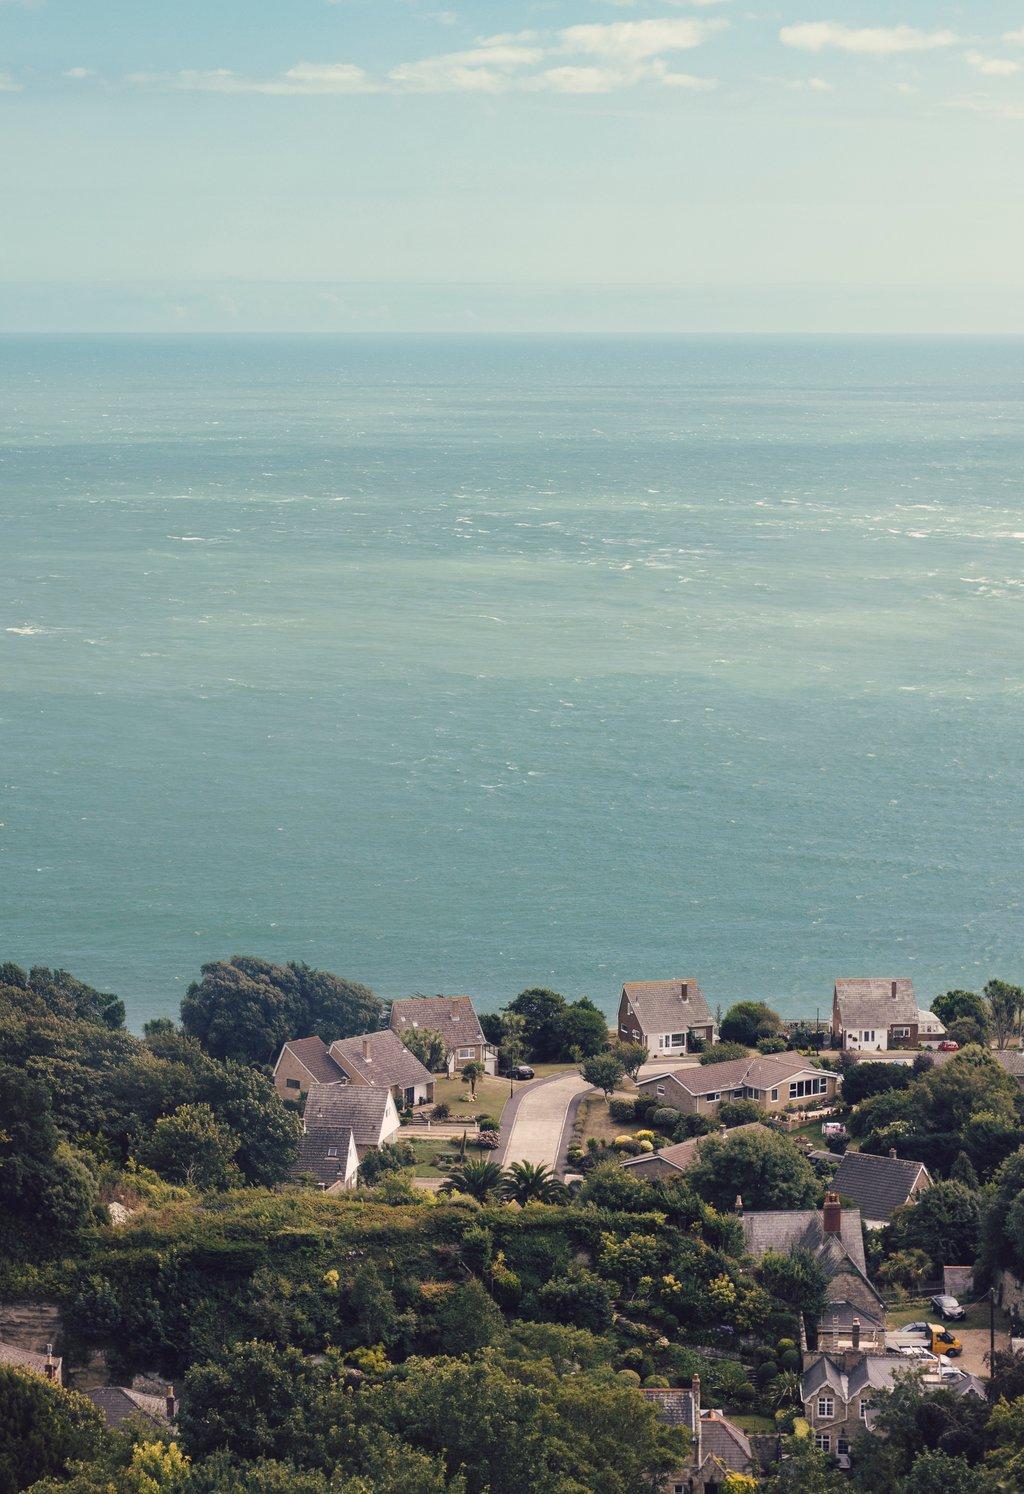 Isle_of_Wight_2_-_Unsplash.jpg?1548648279